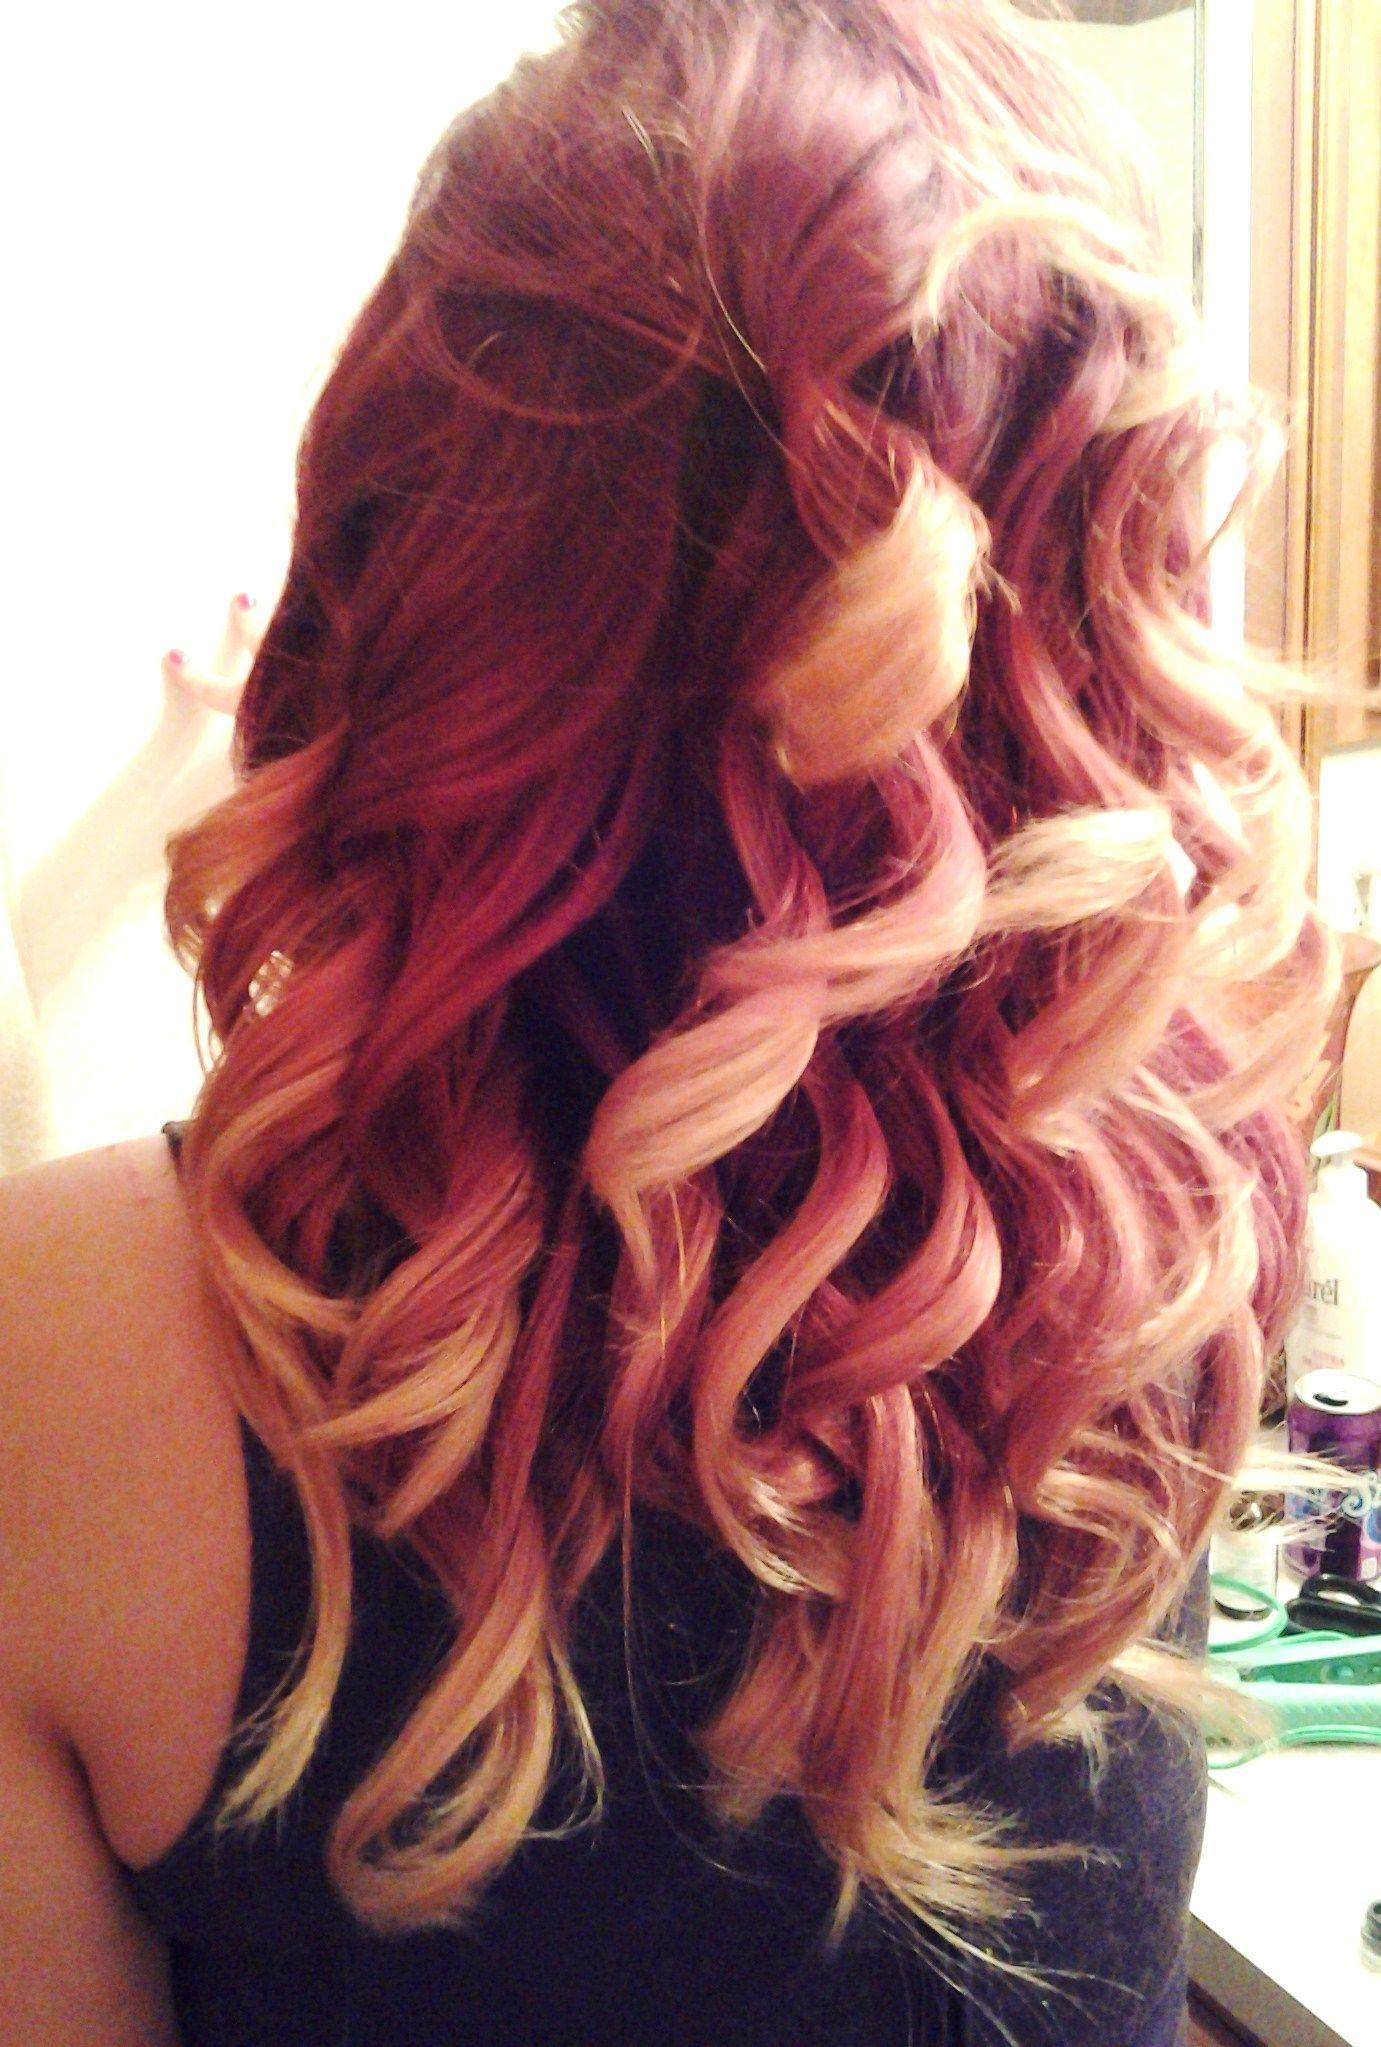 Dark To Red Ombre 2 Jpg 1381 2047 Medium Ombre Hair Hair Dark Red Hair